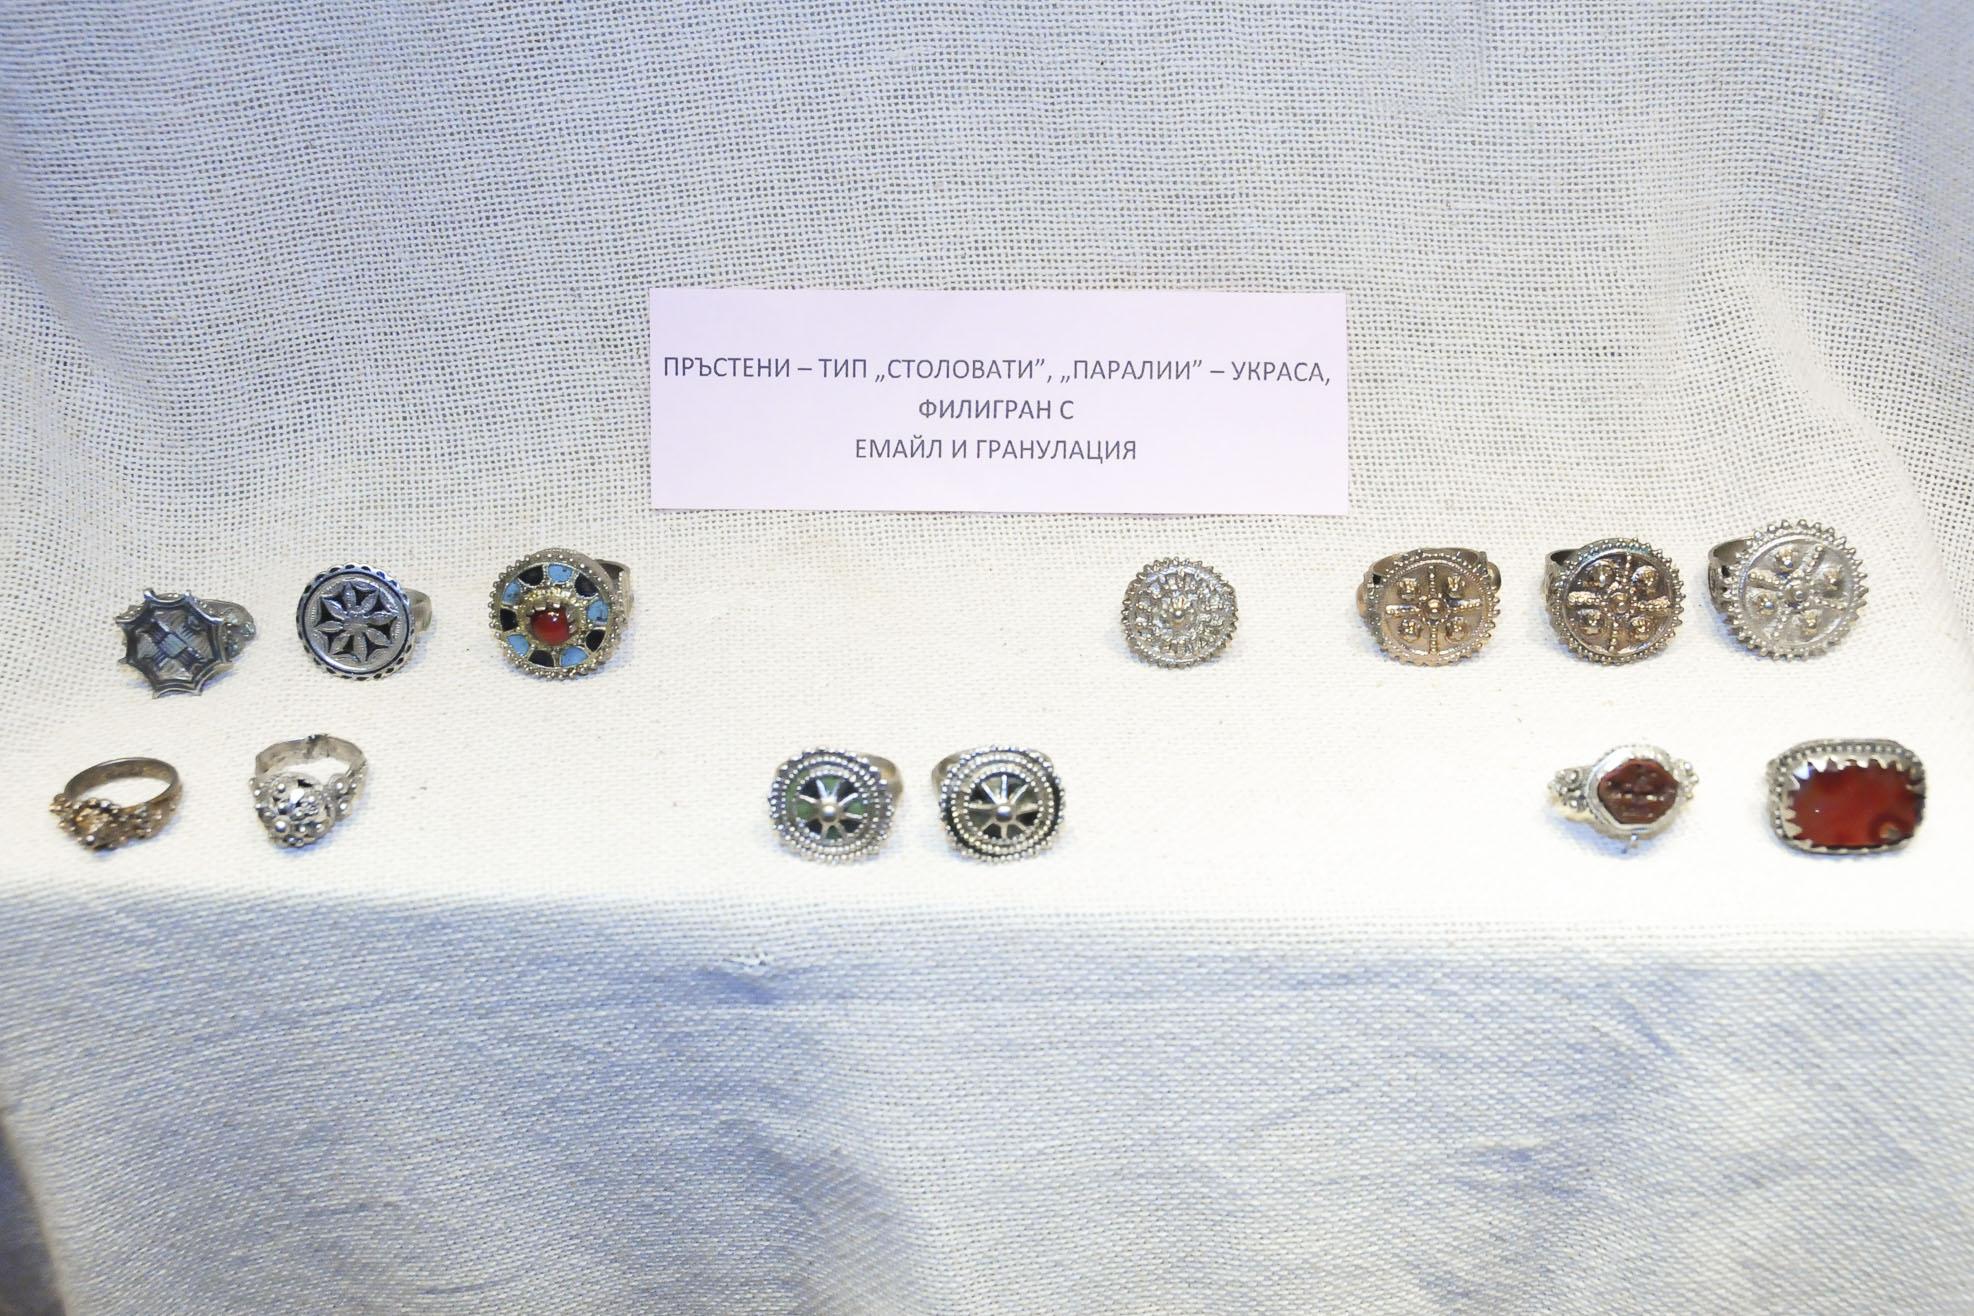 troyan-museum-ot-zlatnite-im-ruce-3